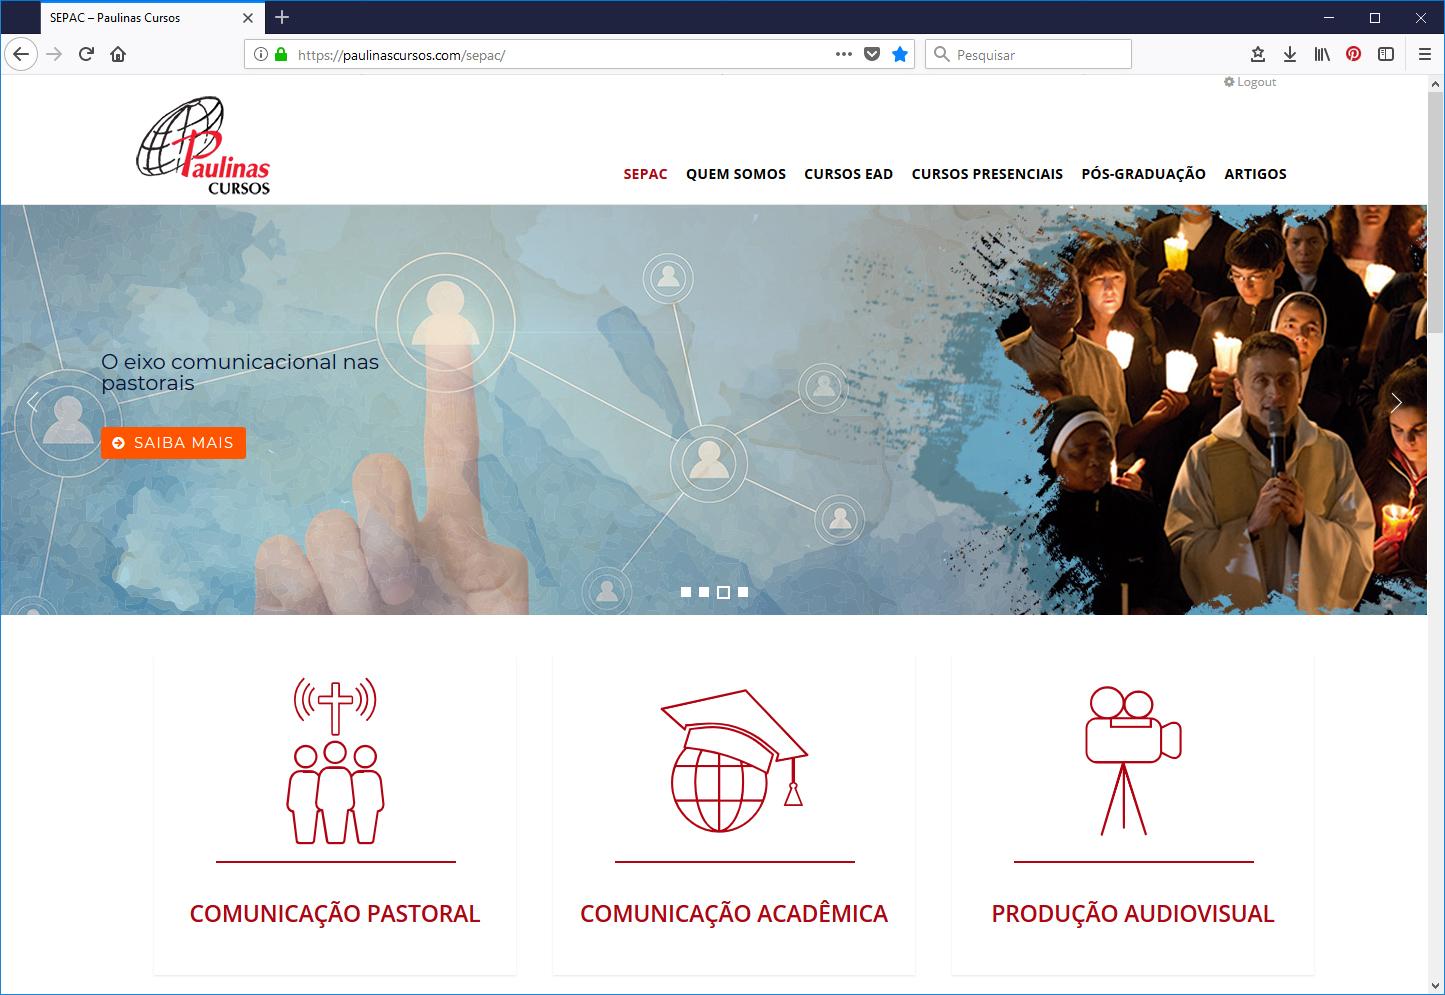 Portal Paulinas Cursos - SEPAC